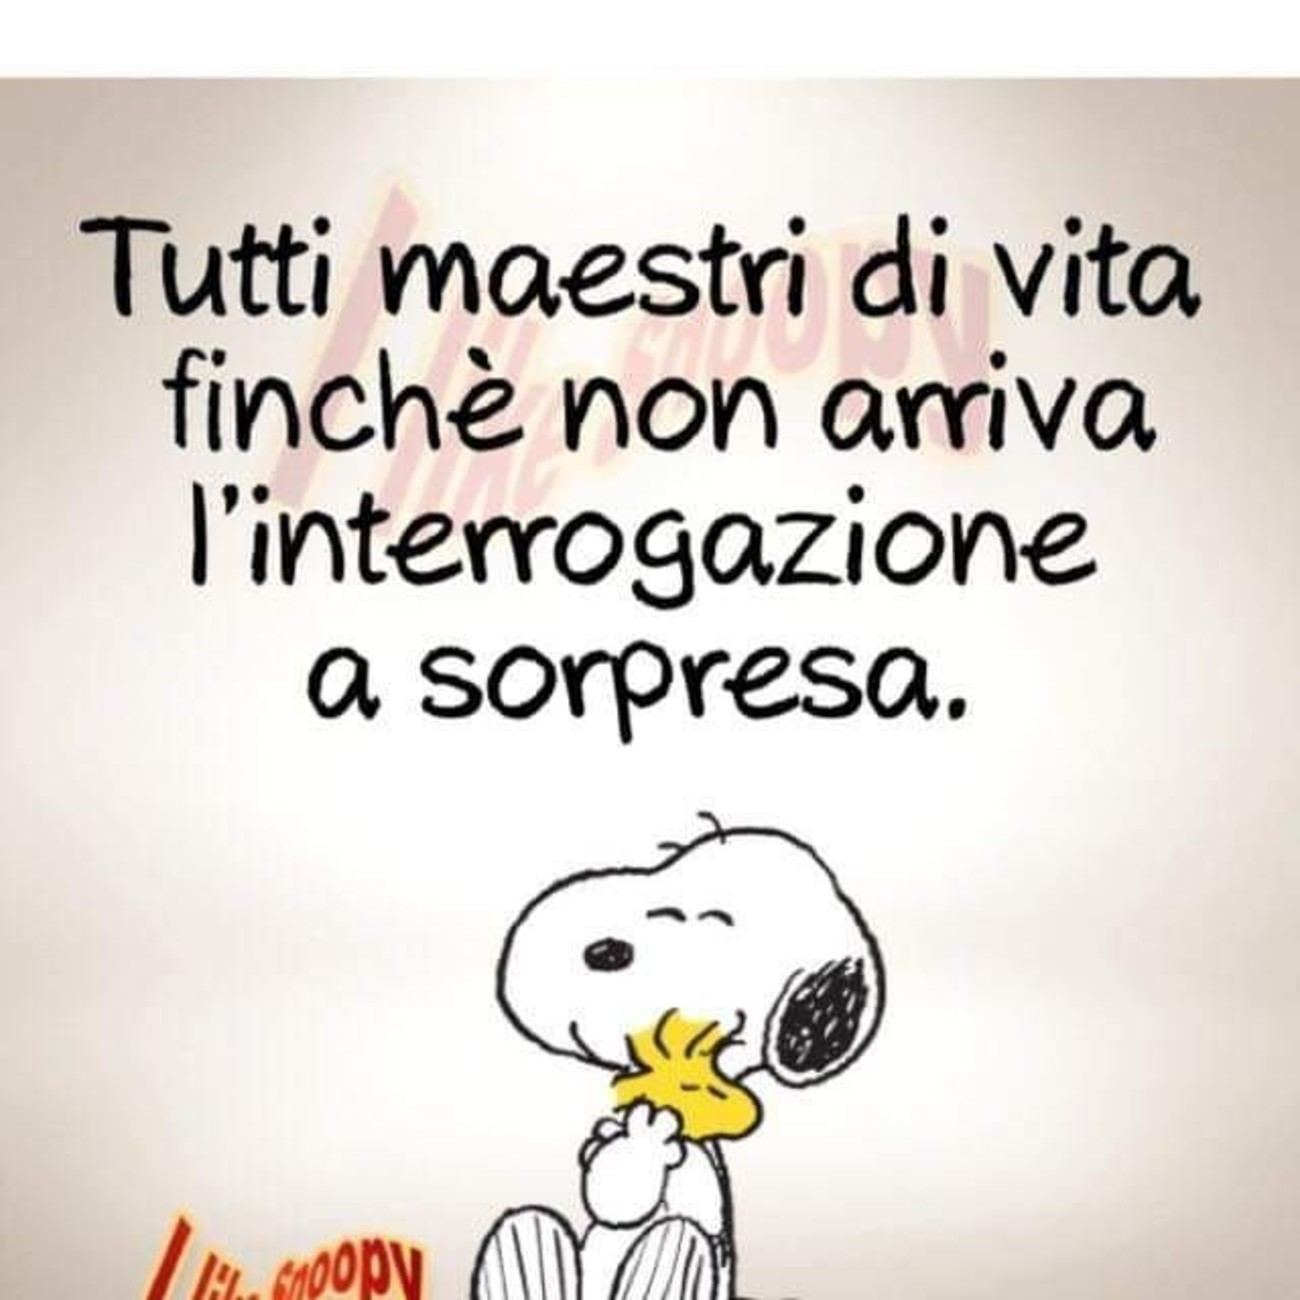 Snoopy E La Vita Immagini Belle Immaginifacebook It